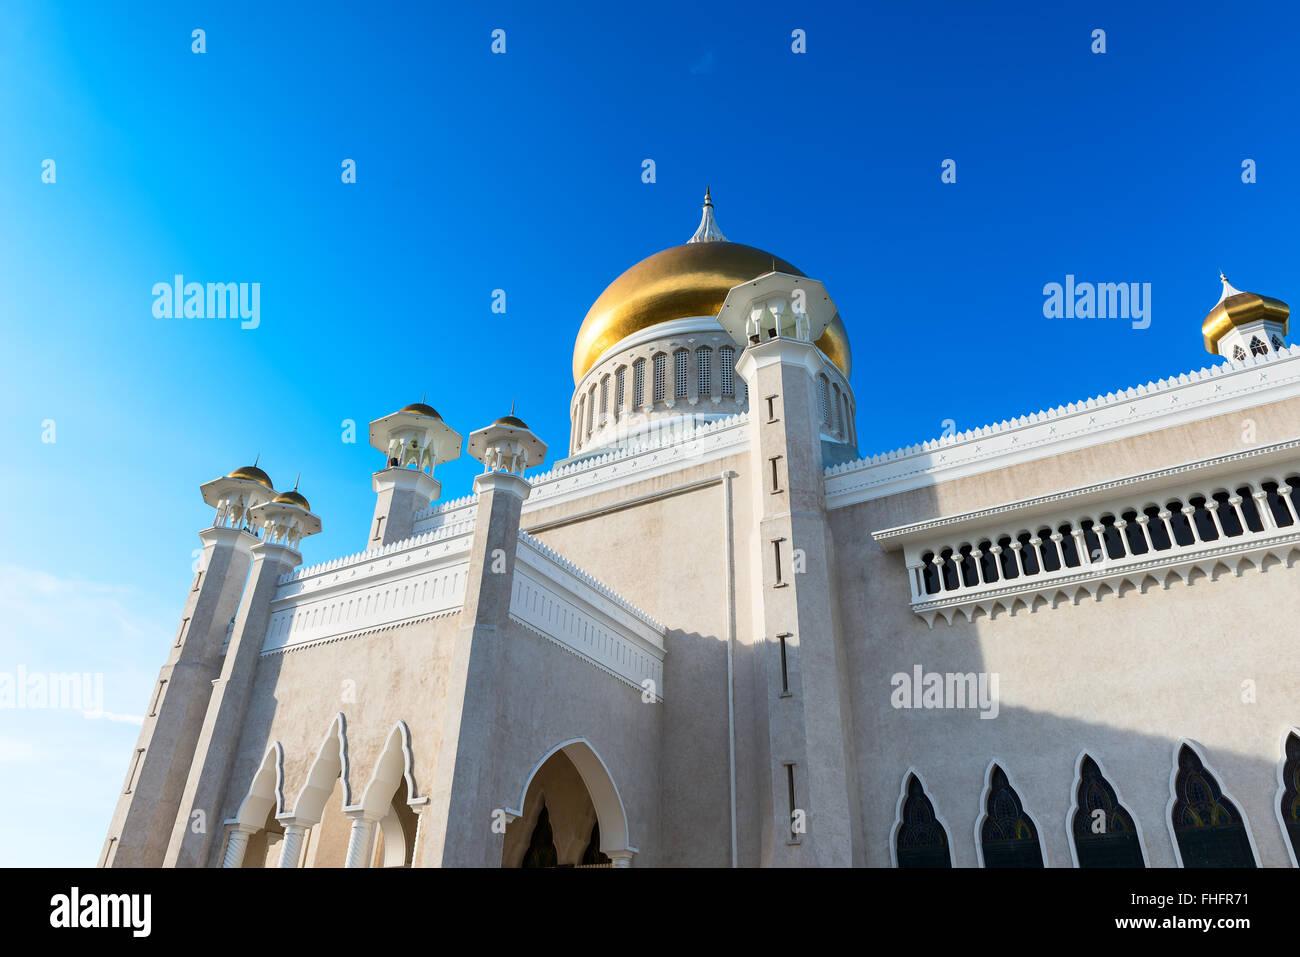 Masjid Sultan Omar Ali Saifuddin Mosque and royal barge in BSB,Bandar Seri Begawan,Brunei - Stock Image